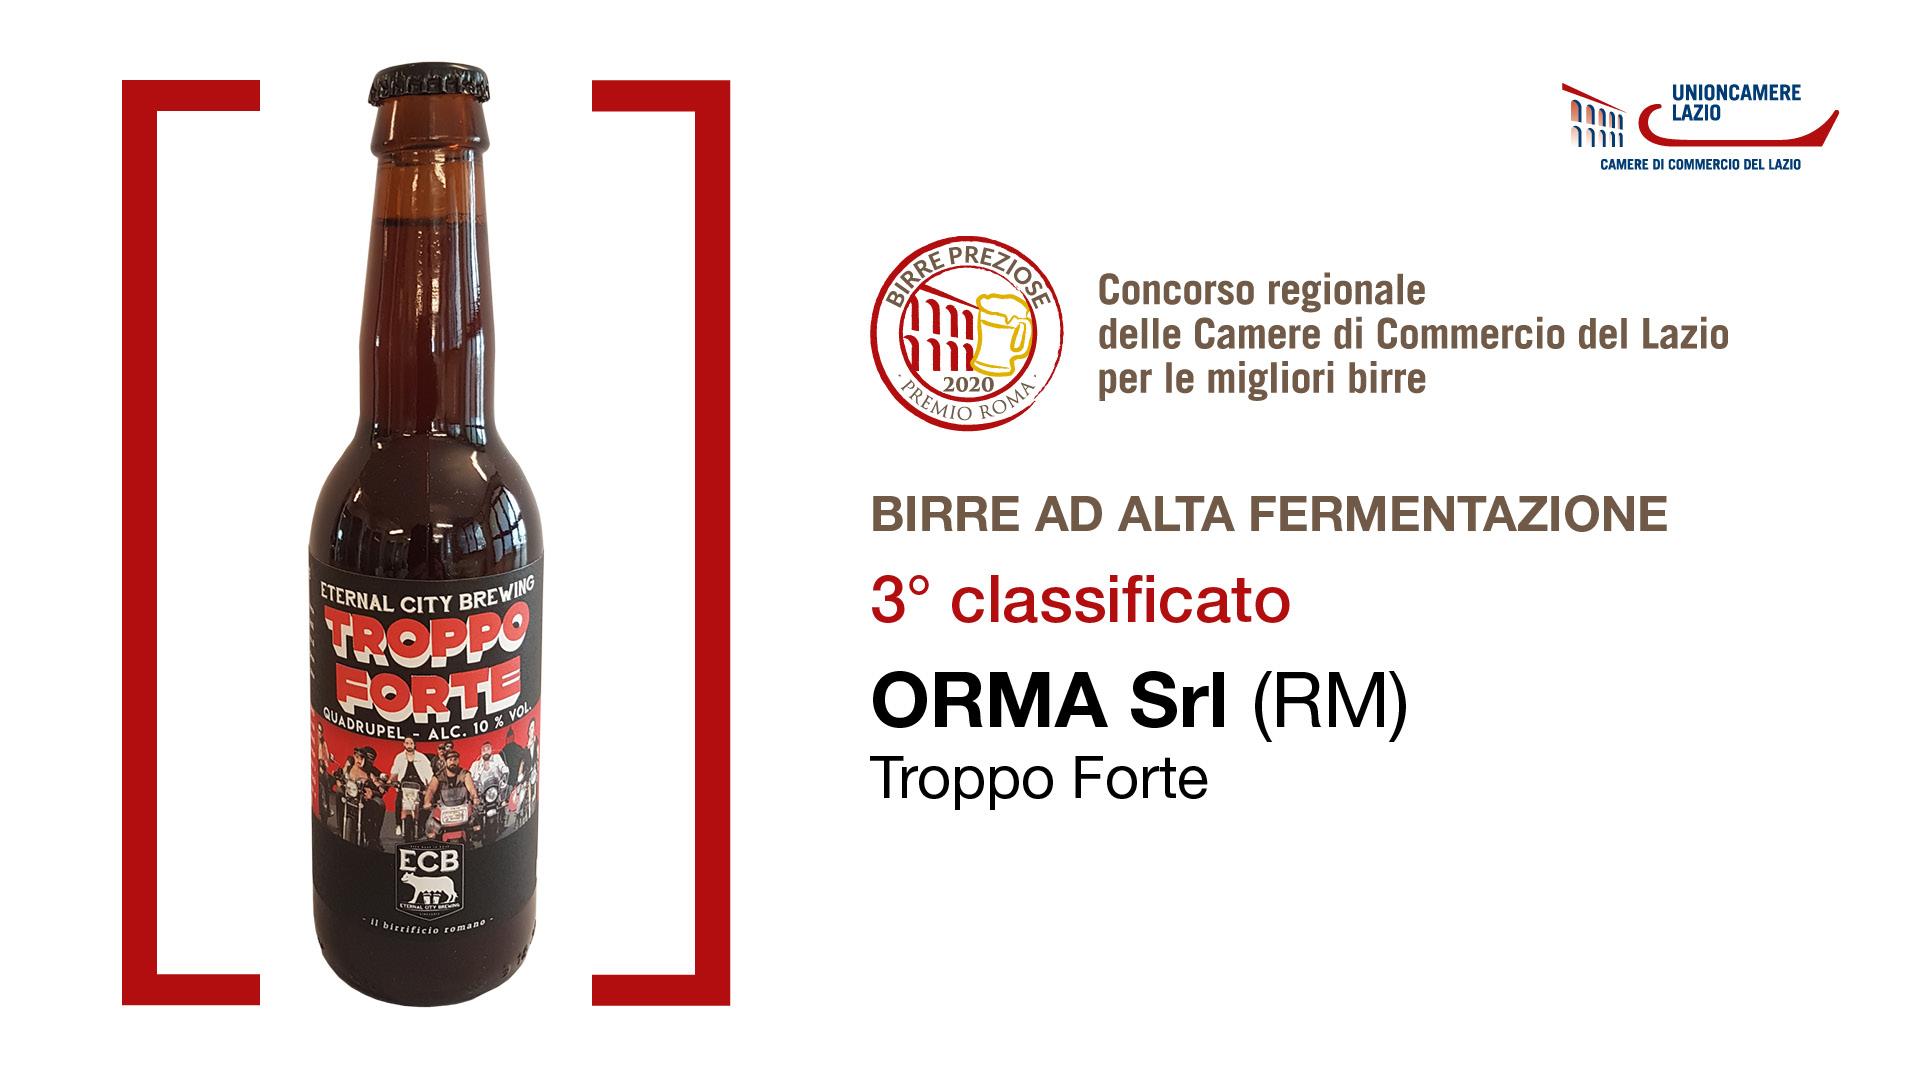 ORMA Srl (RM)